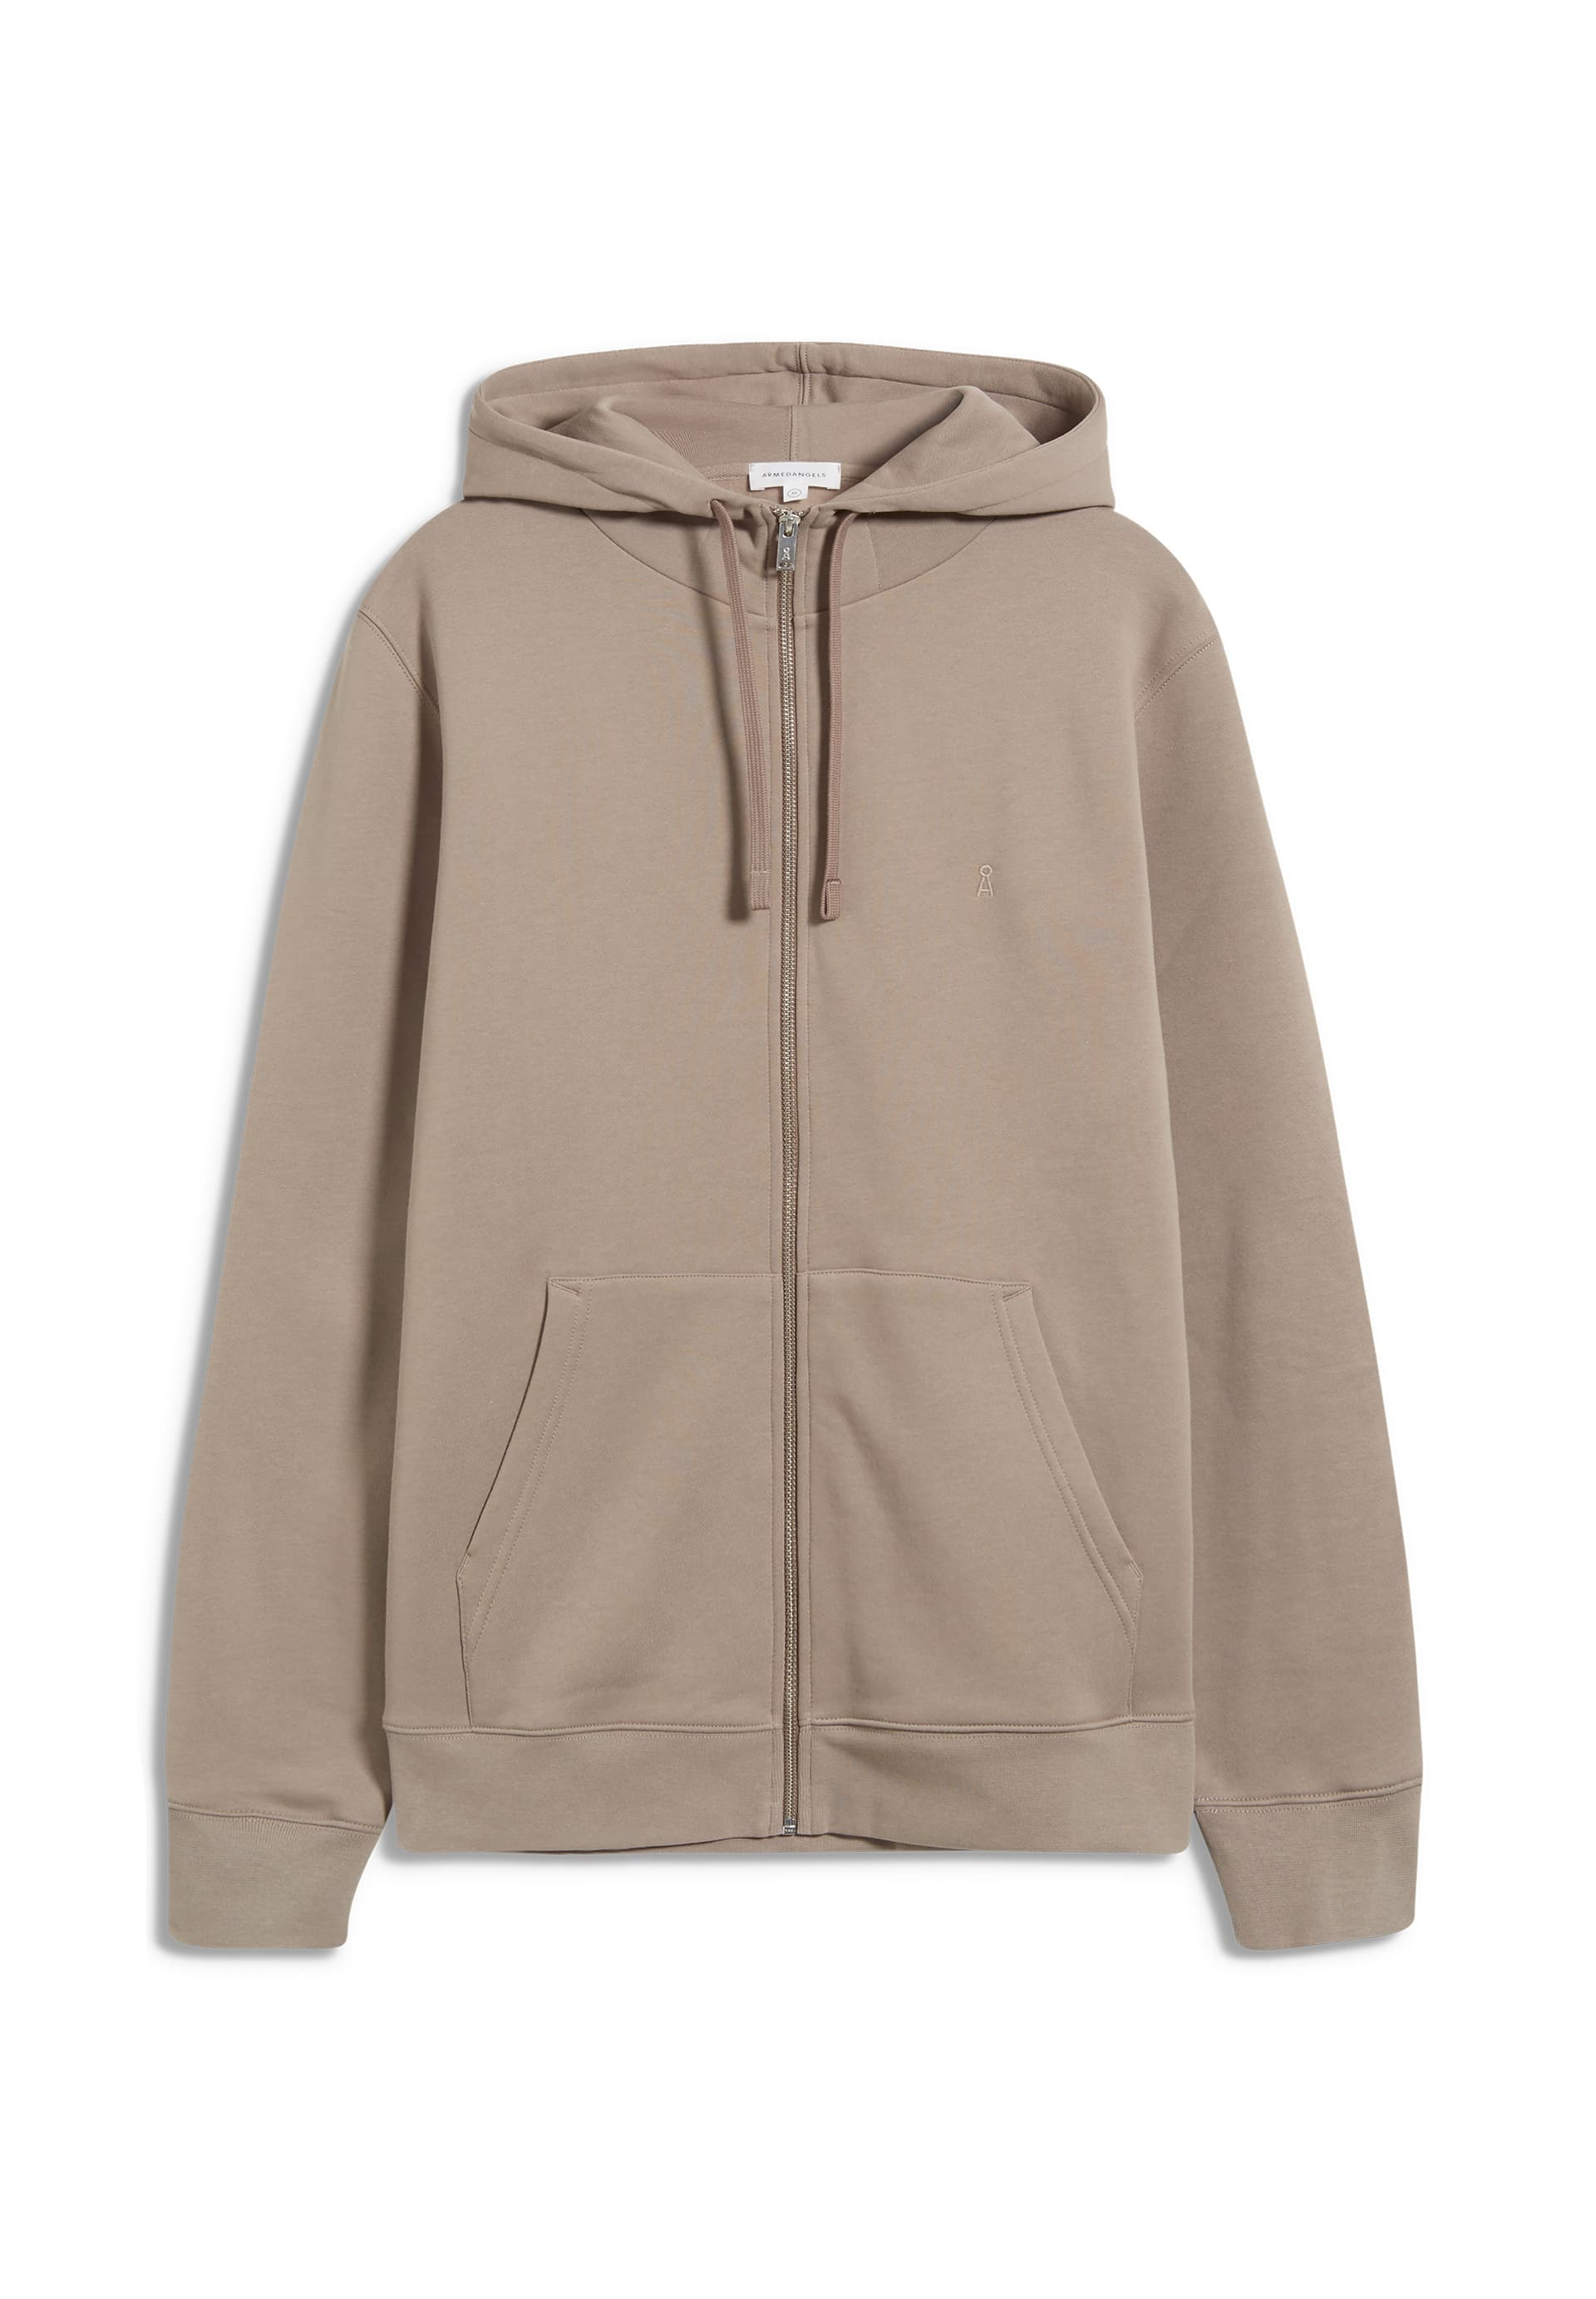 GAASTON COMFORT Sweatjacket made of Organic Cotton